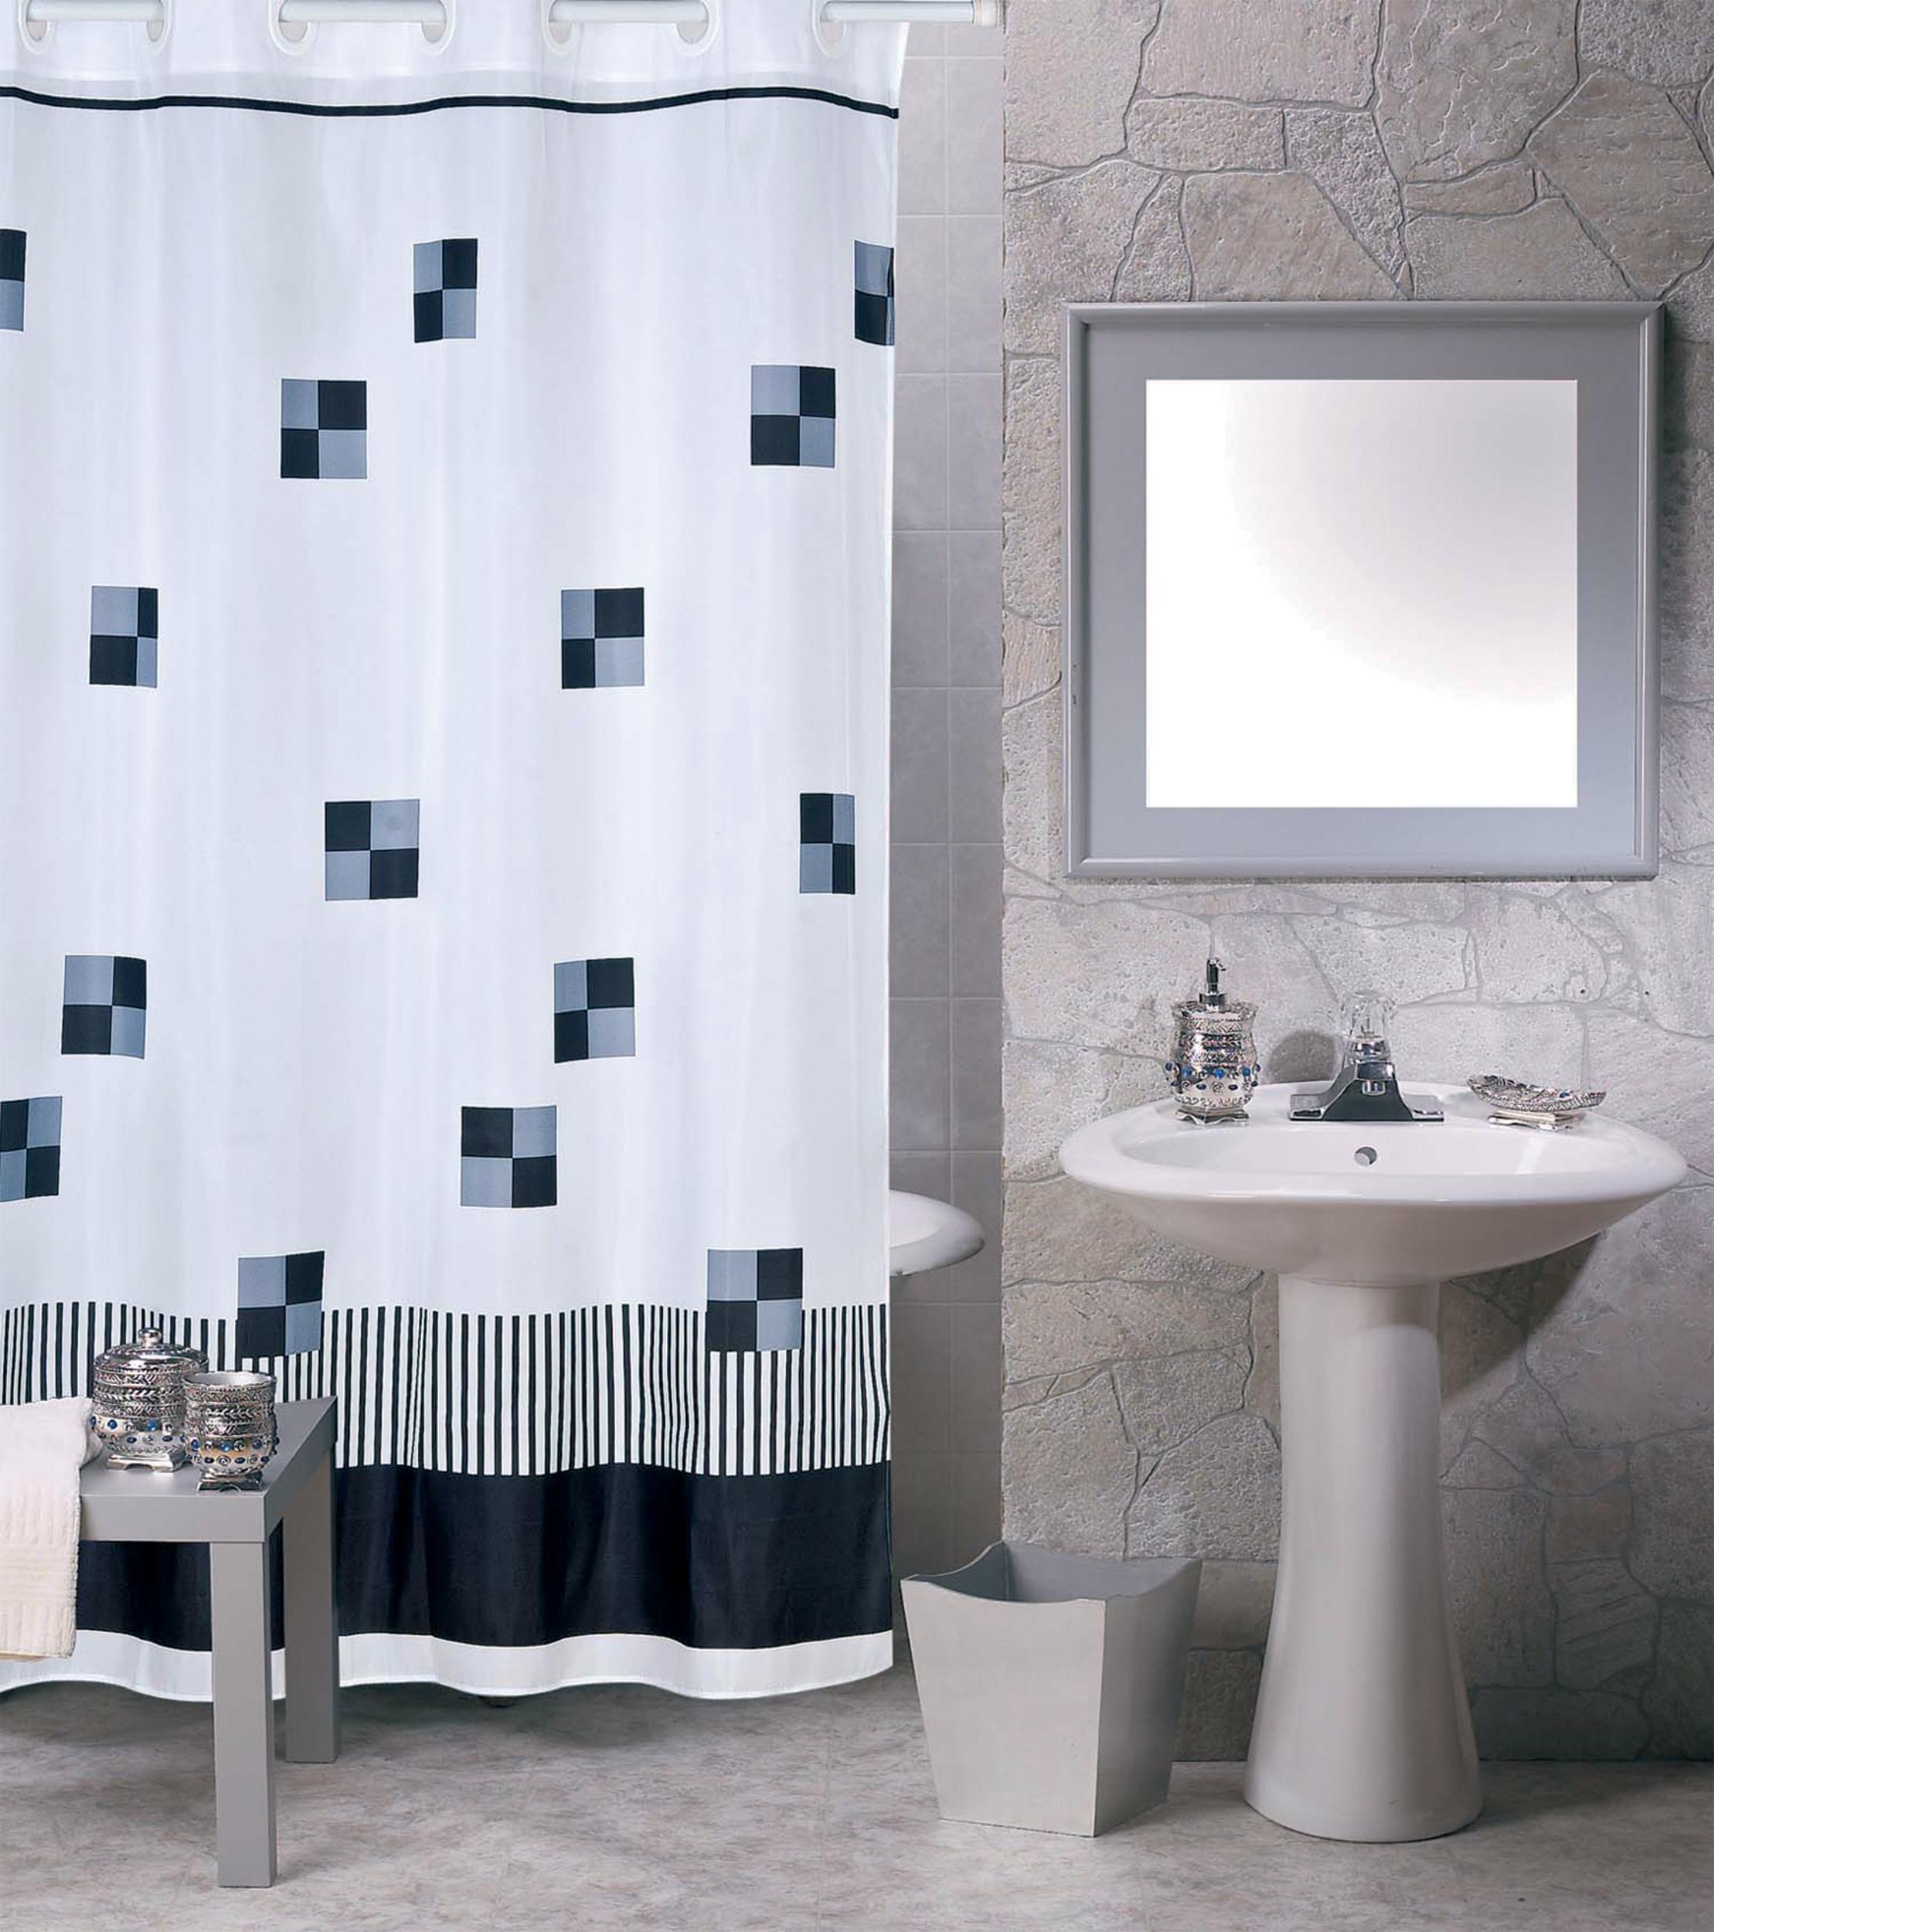 MSV Duschvorhang 180x200cm Anti Schimmel Textil Badewannenvorhang Wannenvorhang Quadrat2